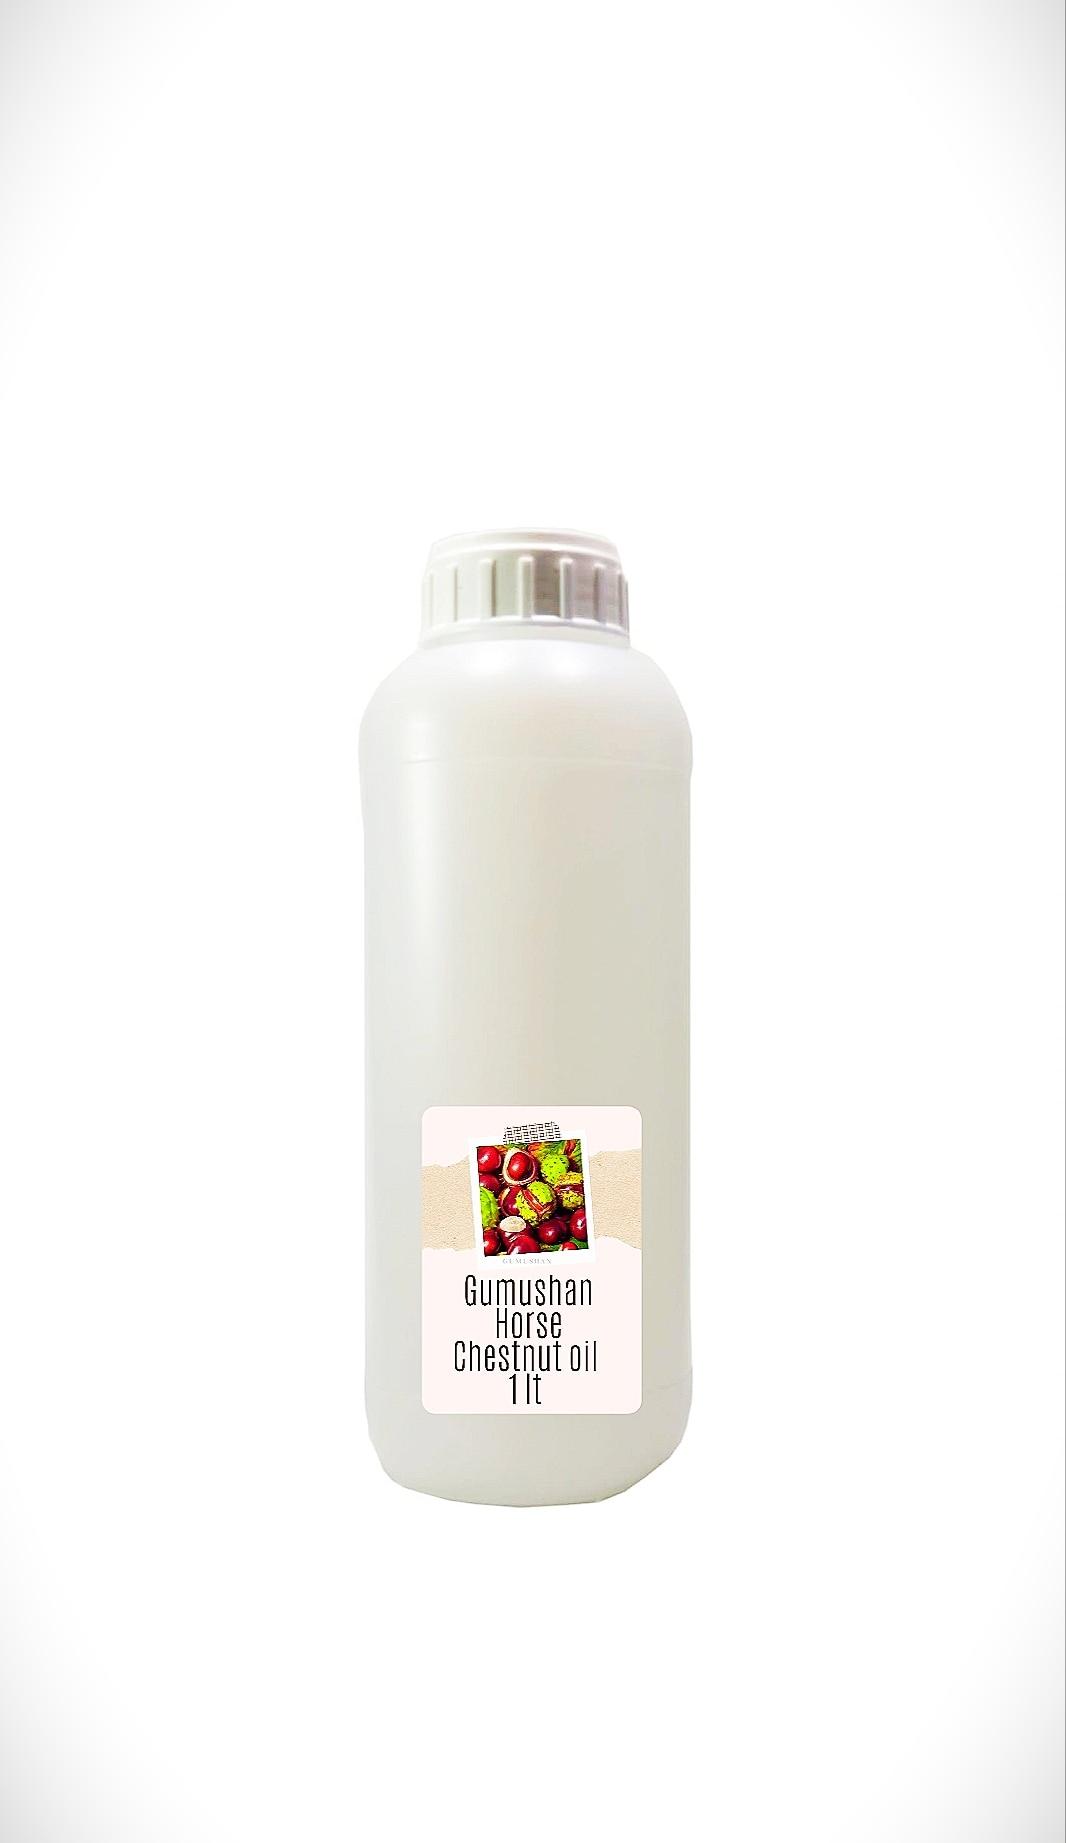 High quality pure Horse Chestnut Oil 1 liter 34 fl oz 1000ml